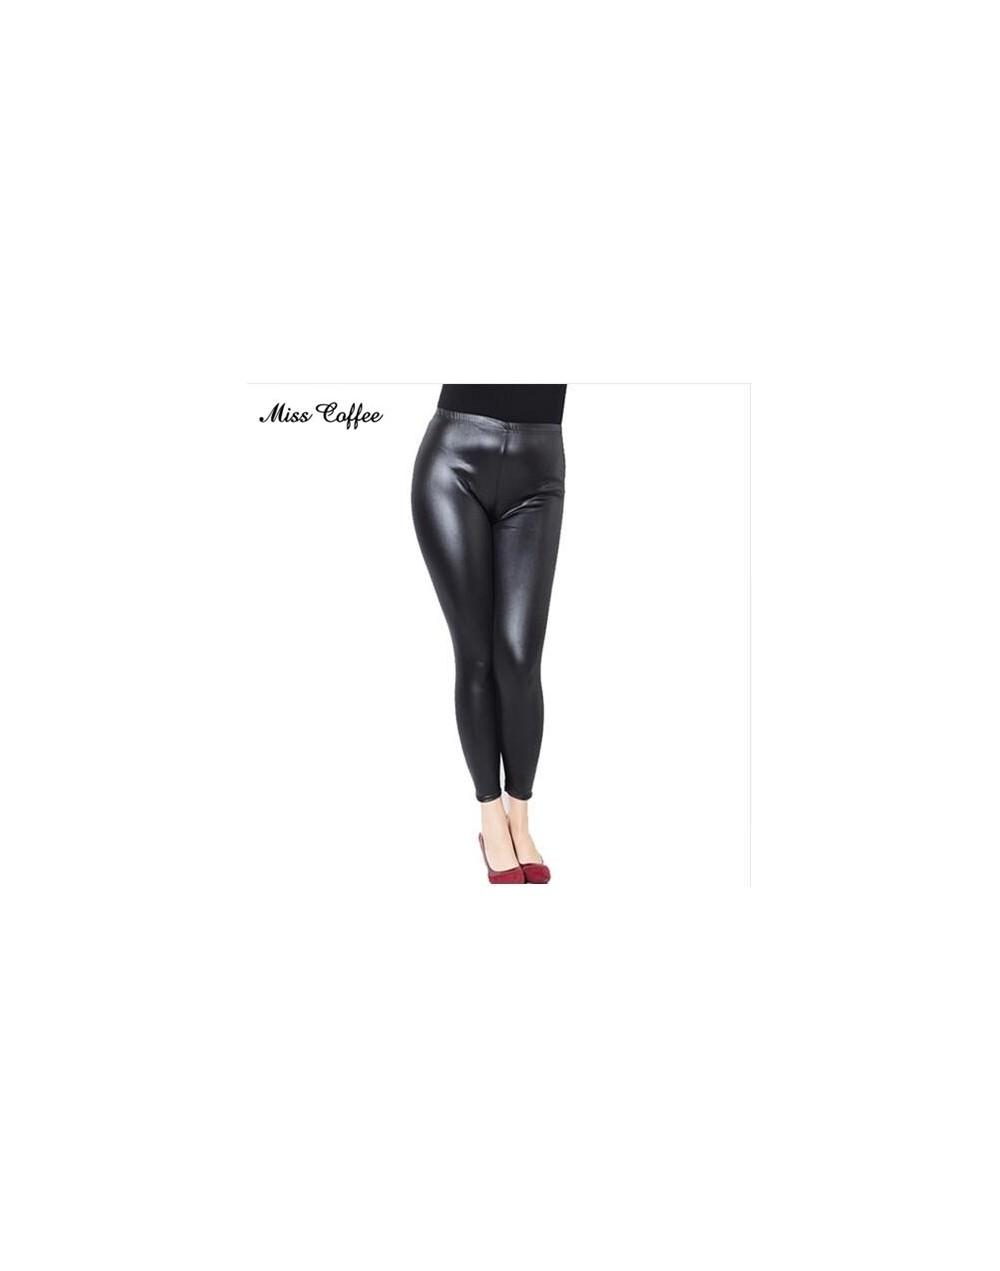 2018 Women High Elastic Thin Faux Leather Leggings Large Size Xl-5XL Imitation Leather Pants Skinny Shiny Black Plus Legging...